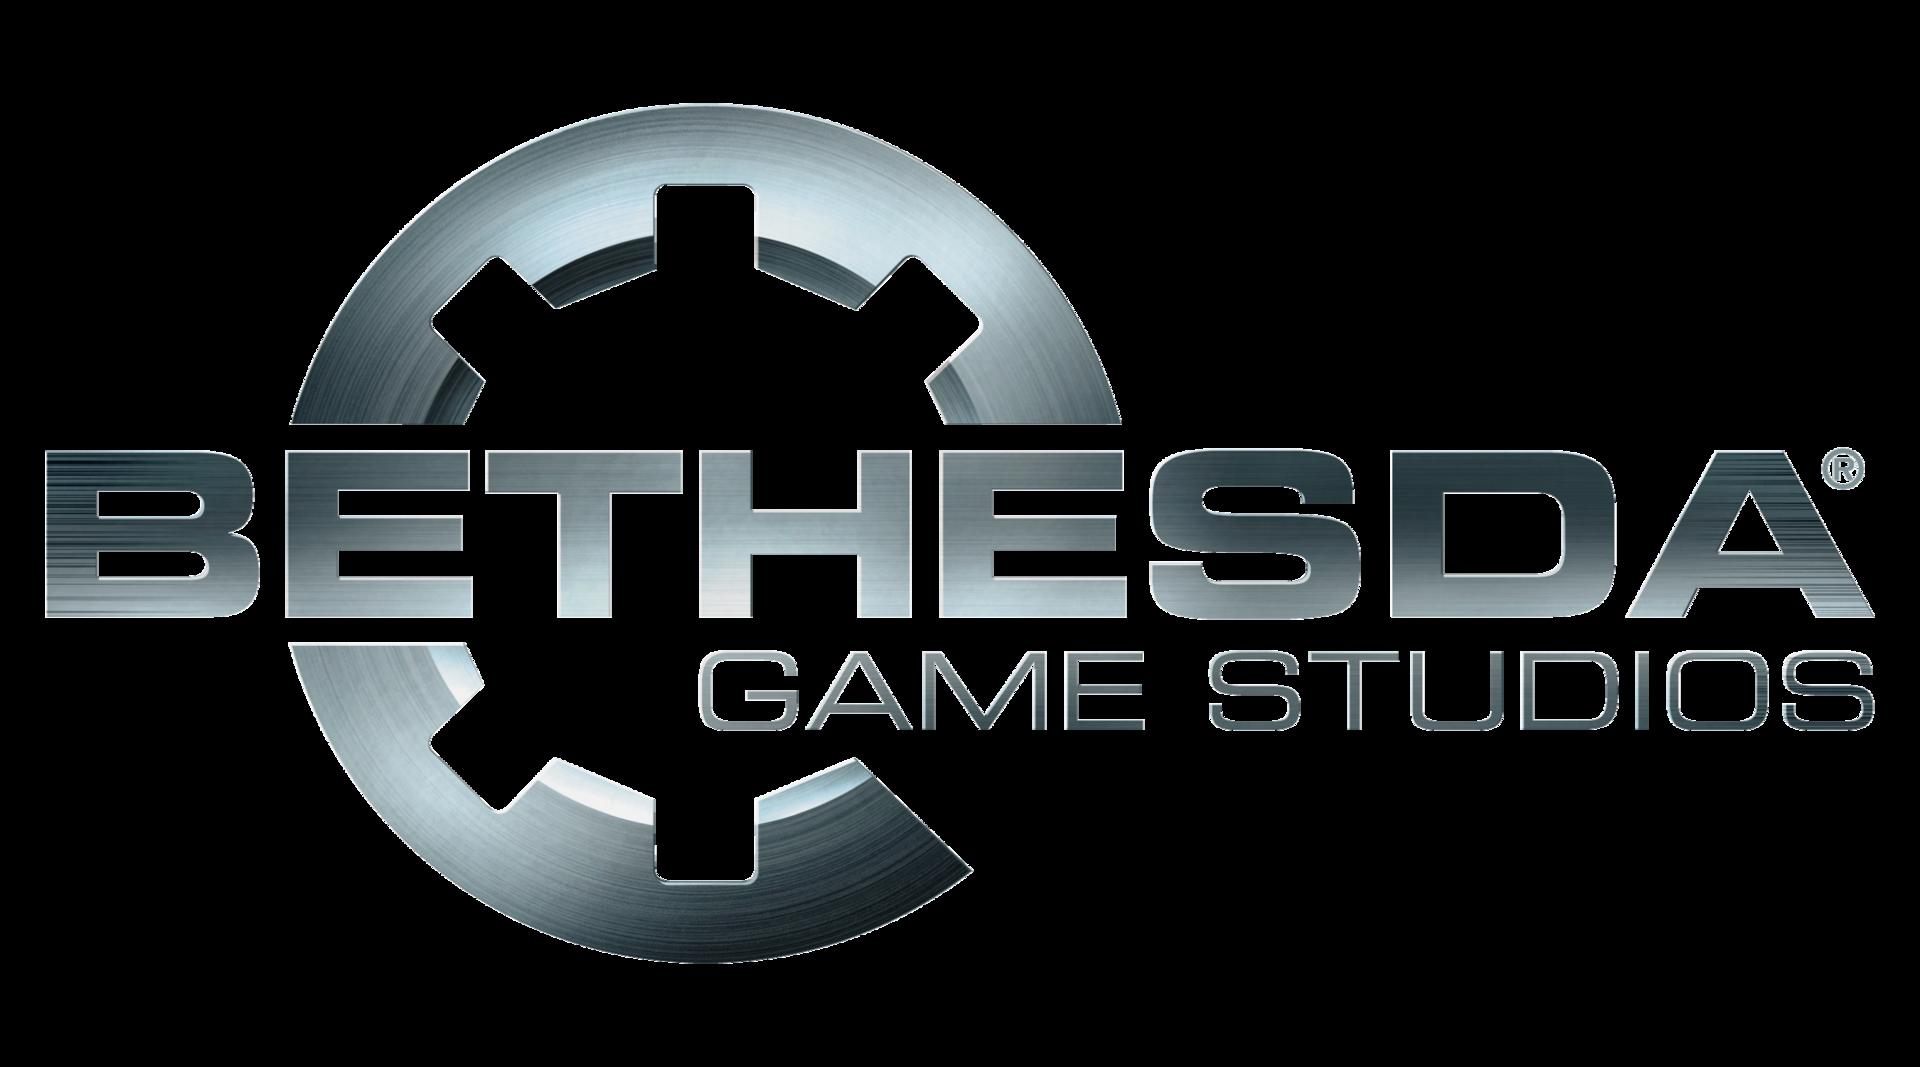 bethesda game studios stock price